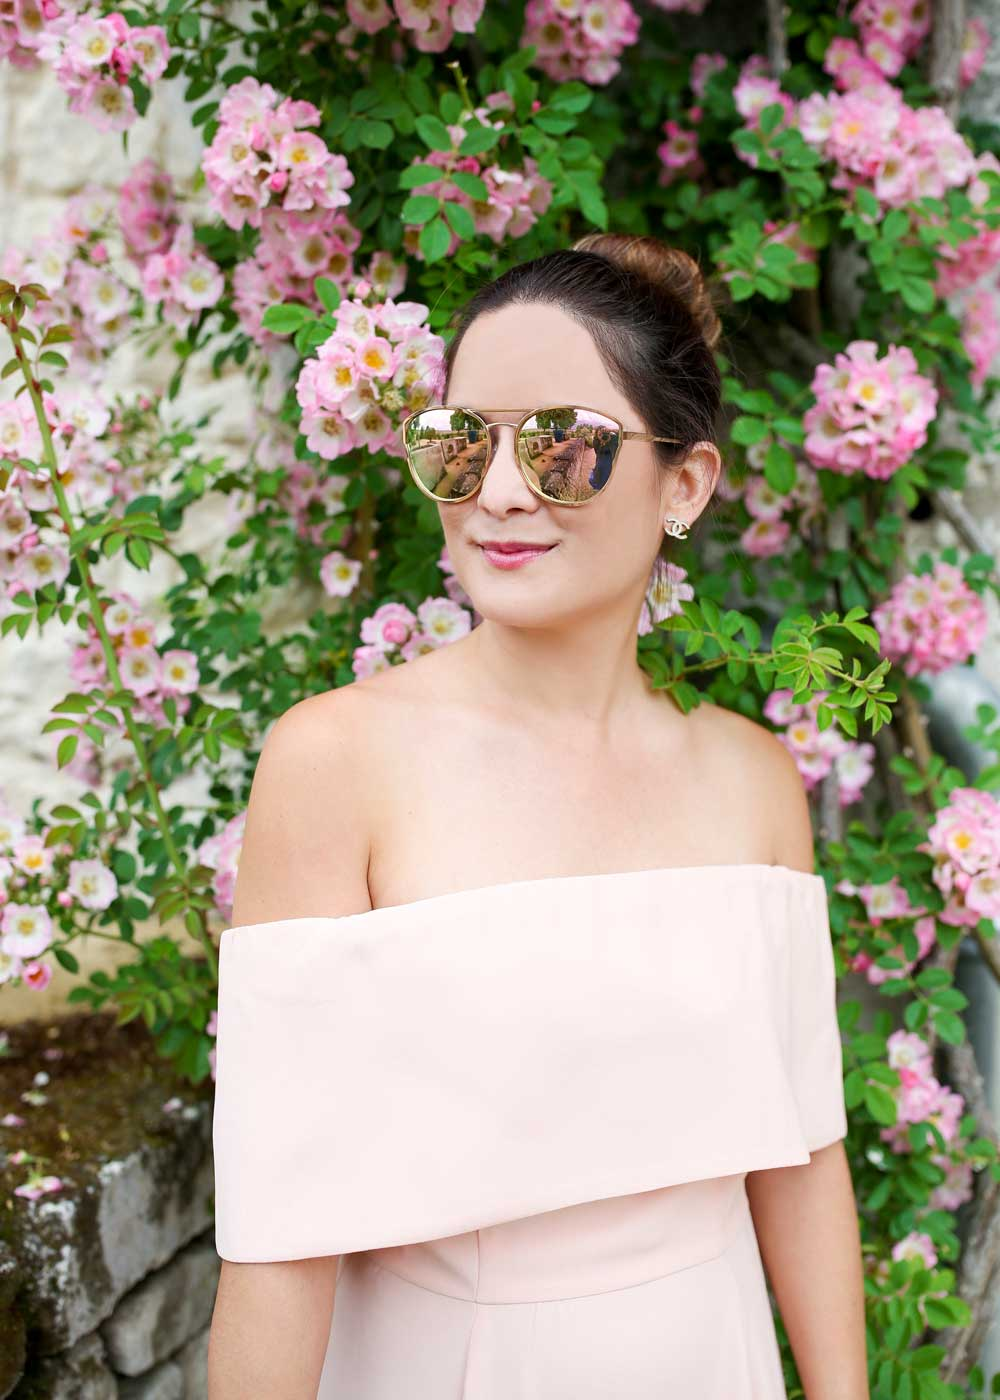 Quay Cherry Bomb Rose Gold Sunglasses